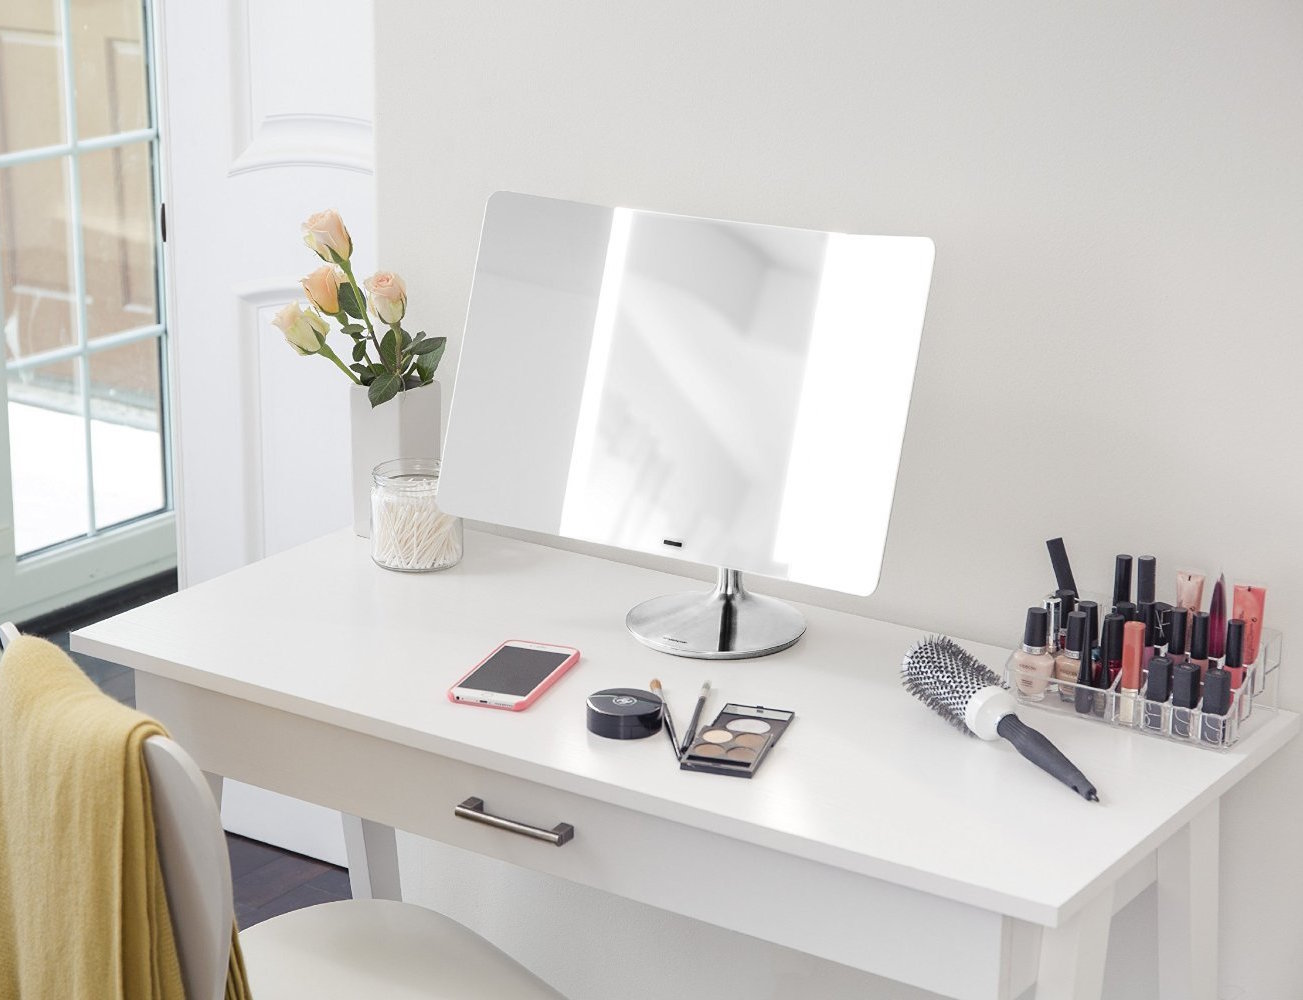 Wide-View Sensor Mirror by simplehuman